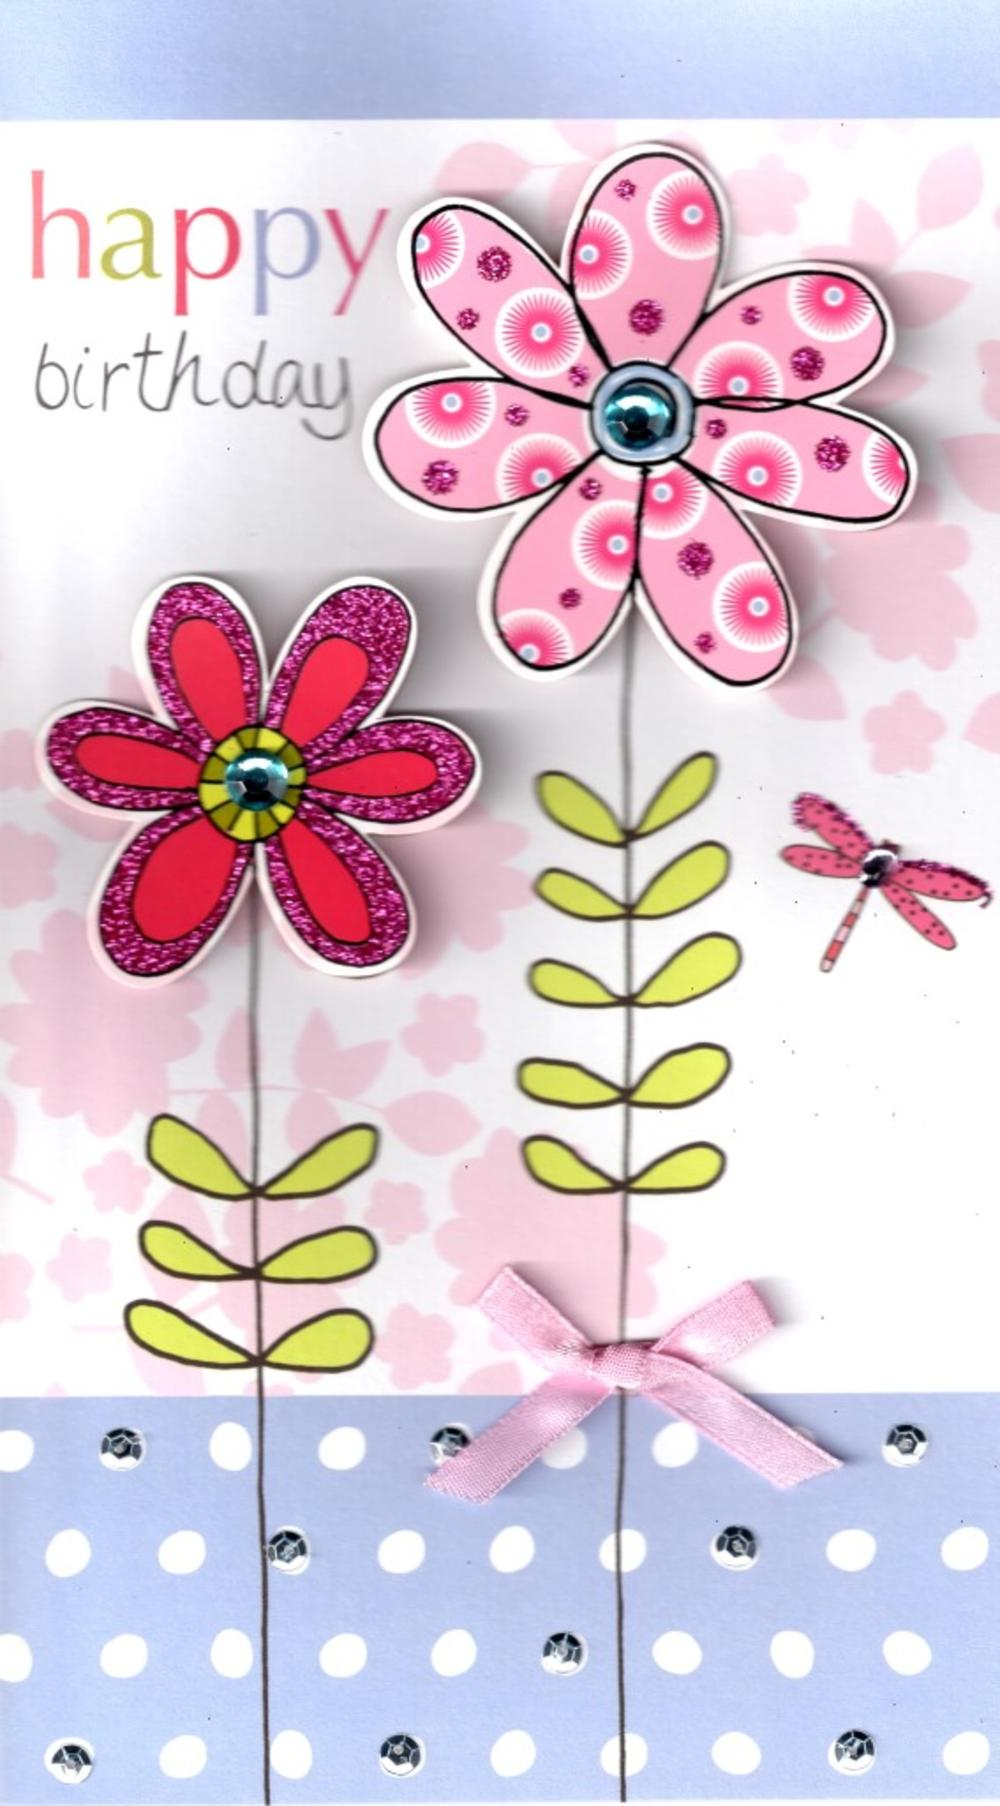 pink flower pretty birthday greeting card  cards  love kates